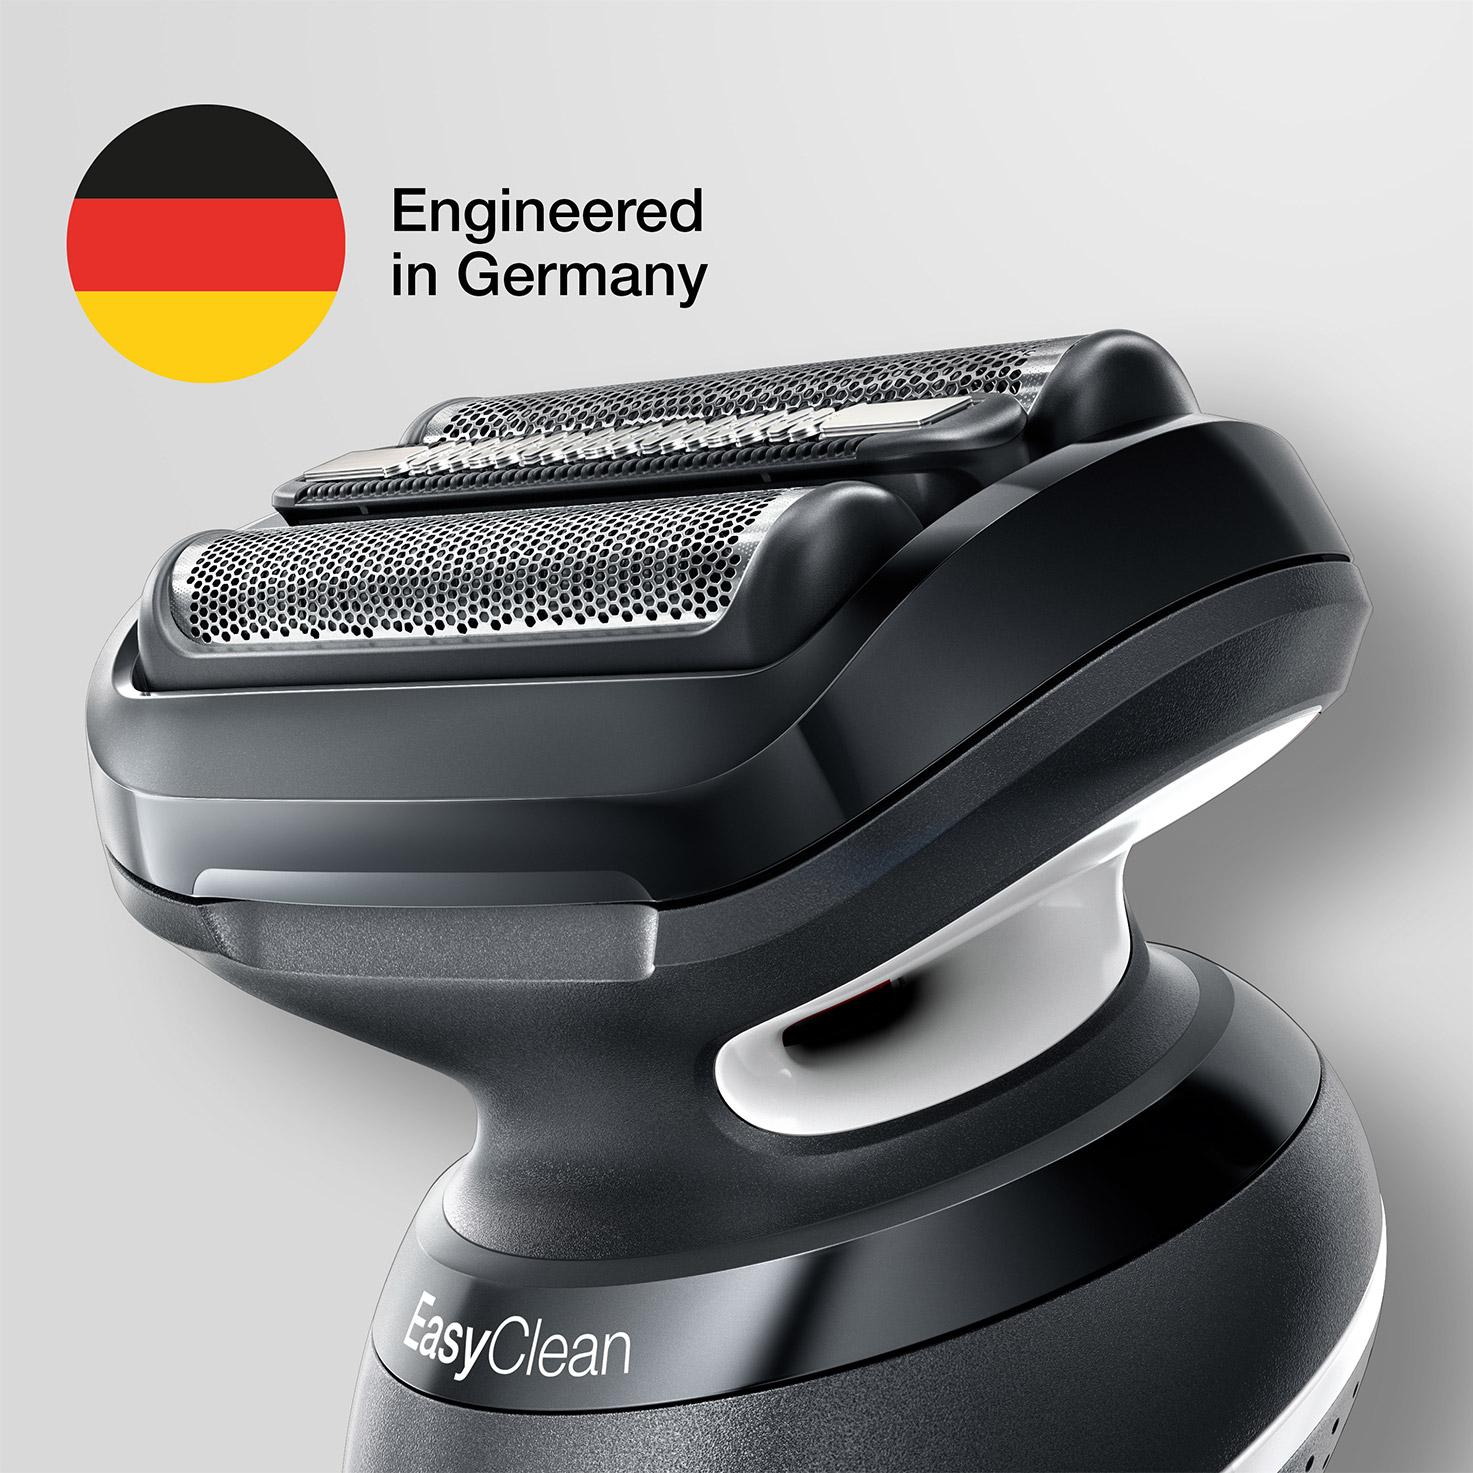 Német tervezés